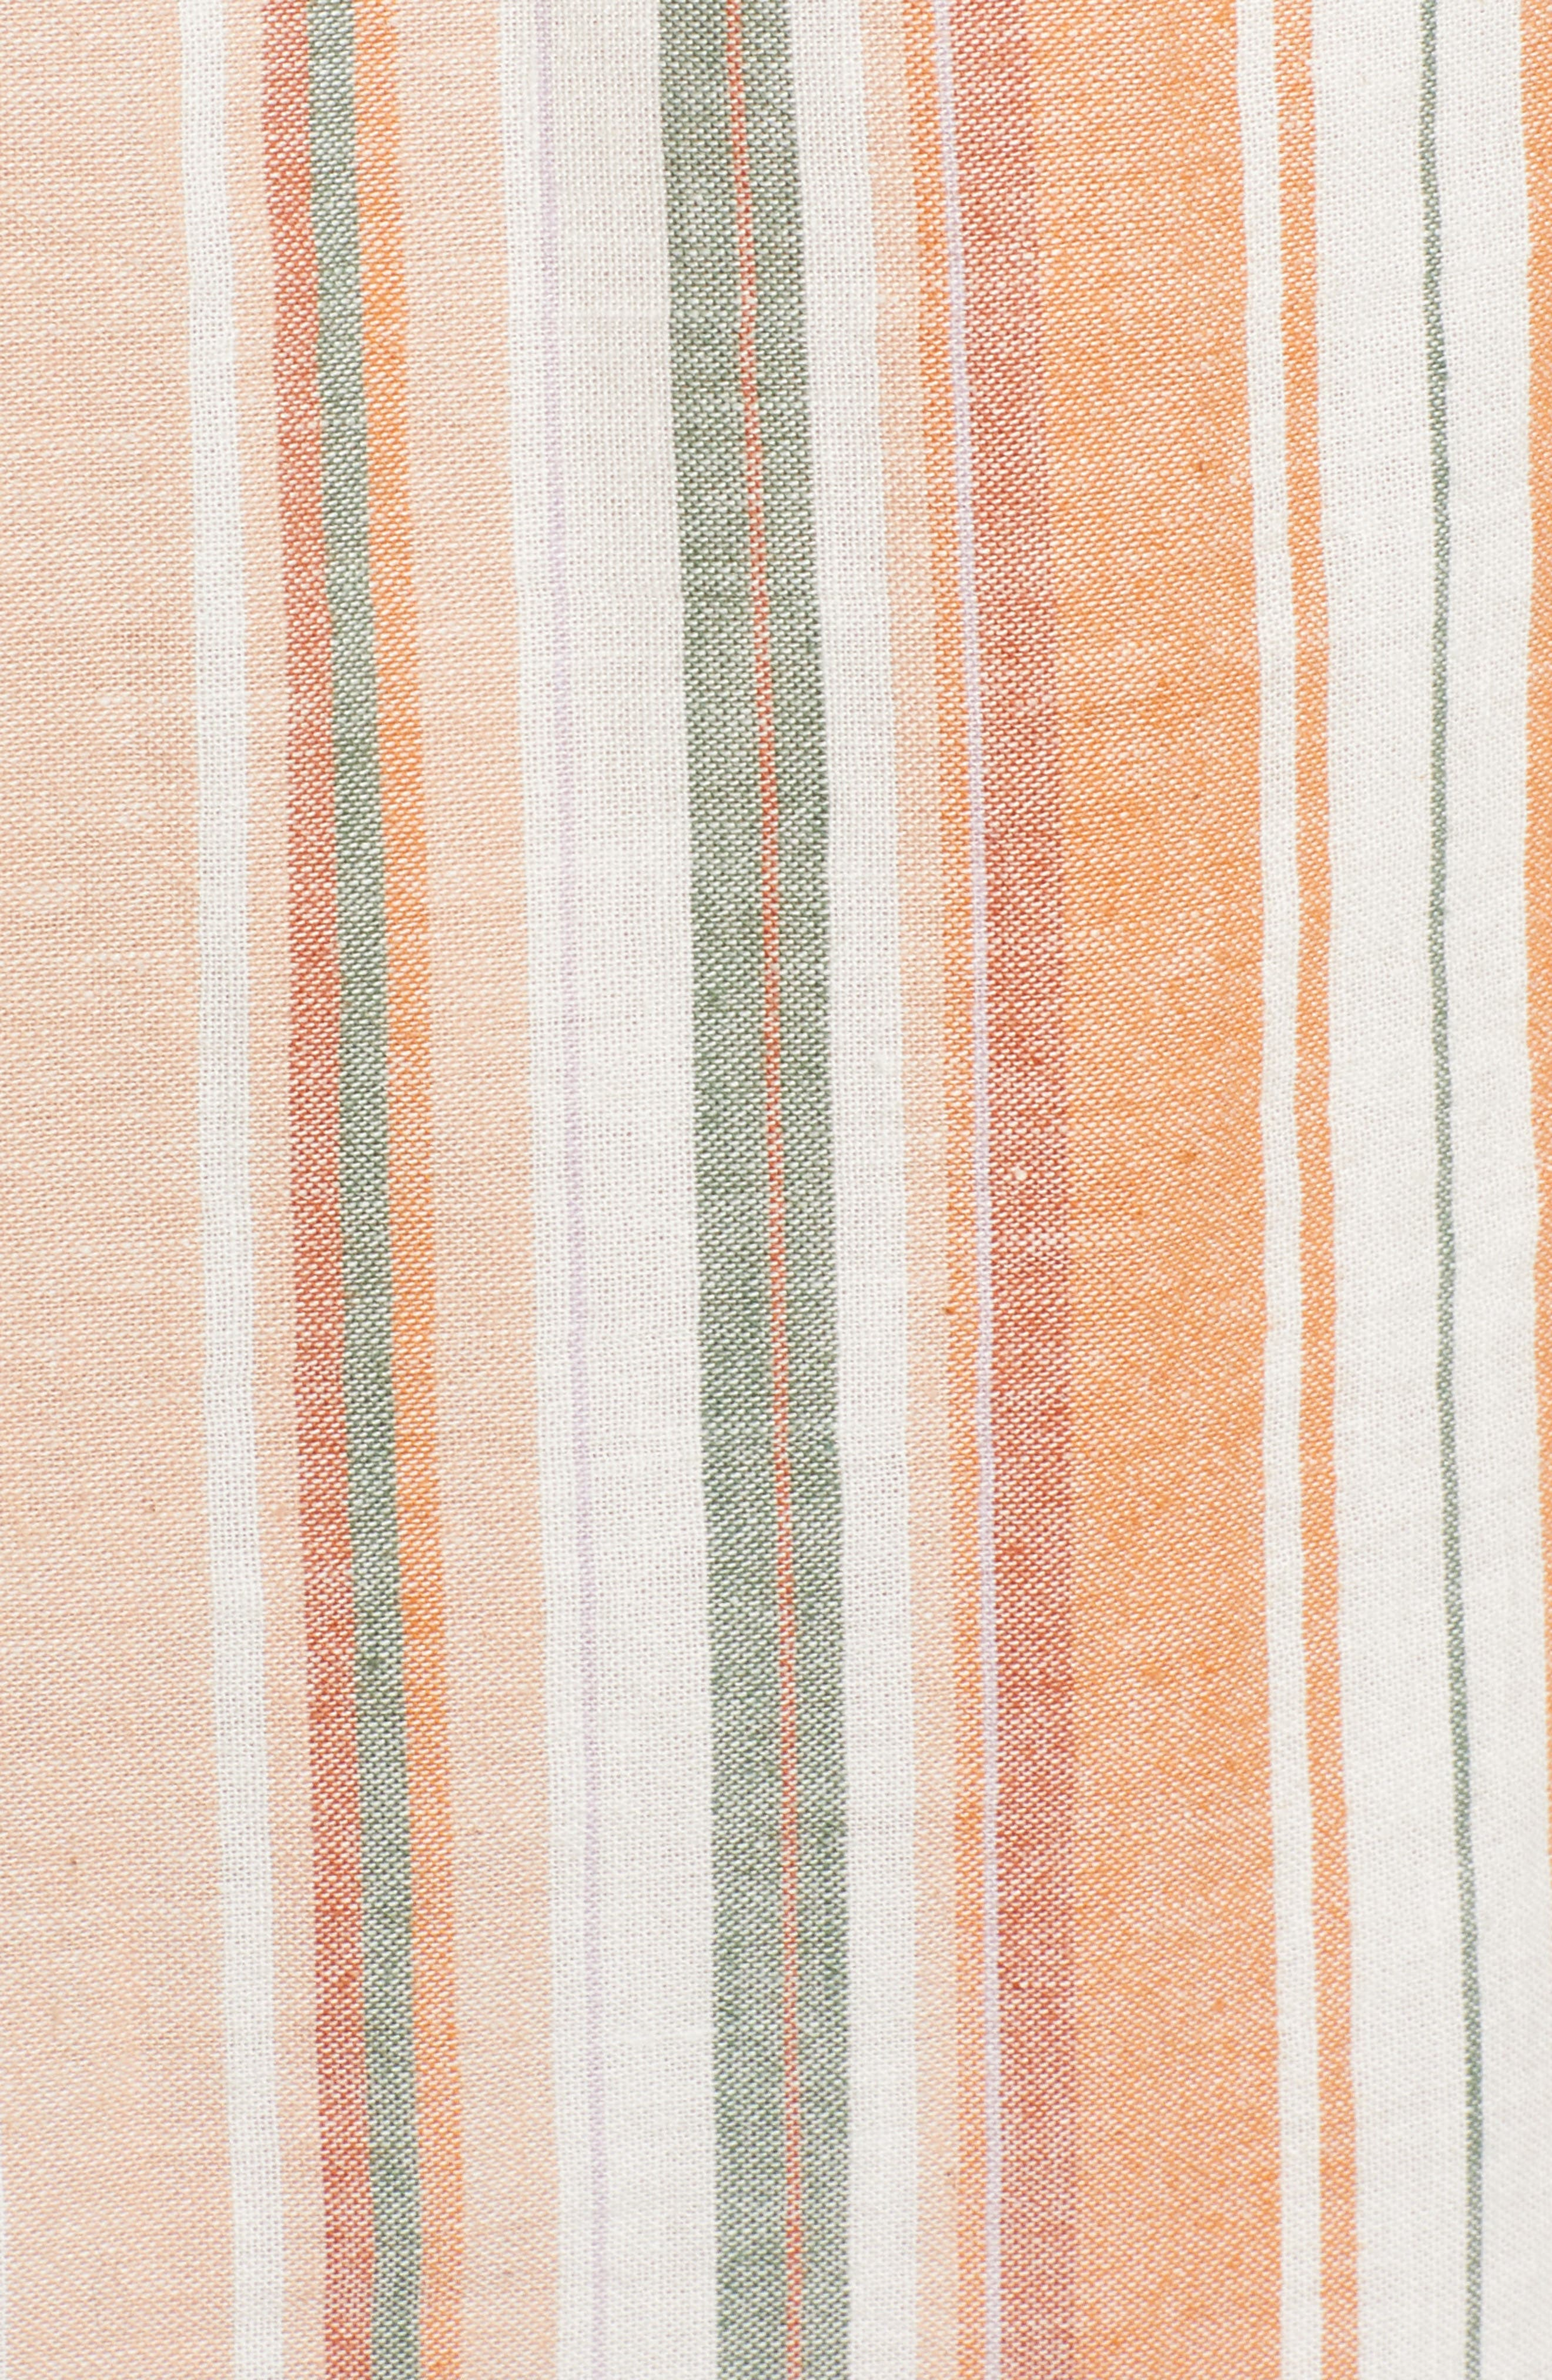 Bishop + Young Sunset Stripe Off the Shoulder Dress,                             Alternate thumbnail 6, color,                             Orange White Stripe